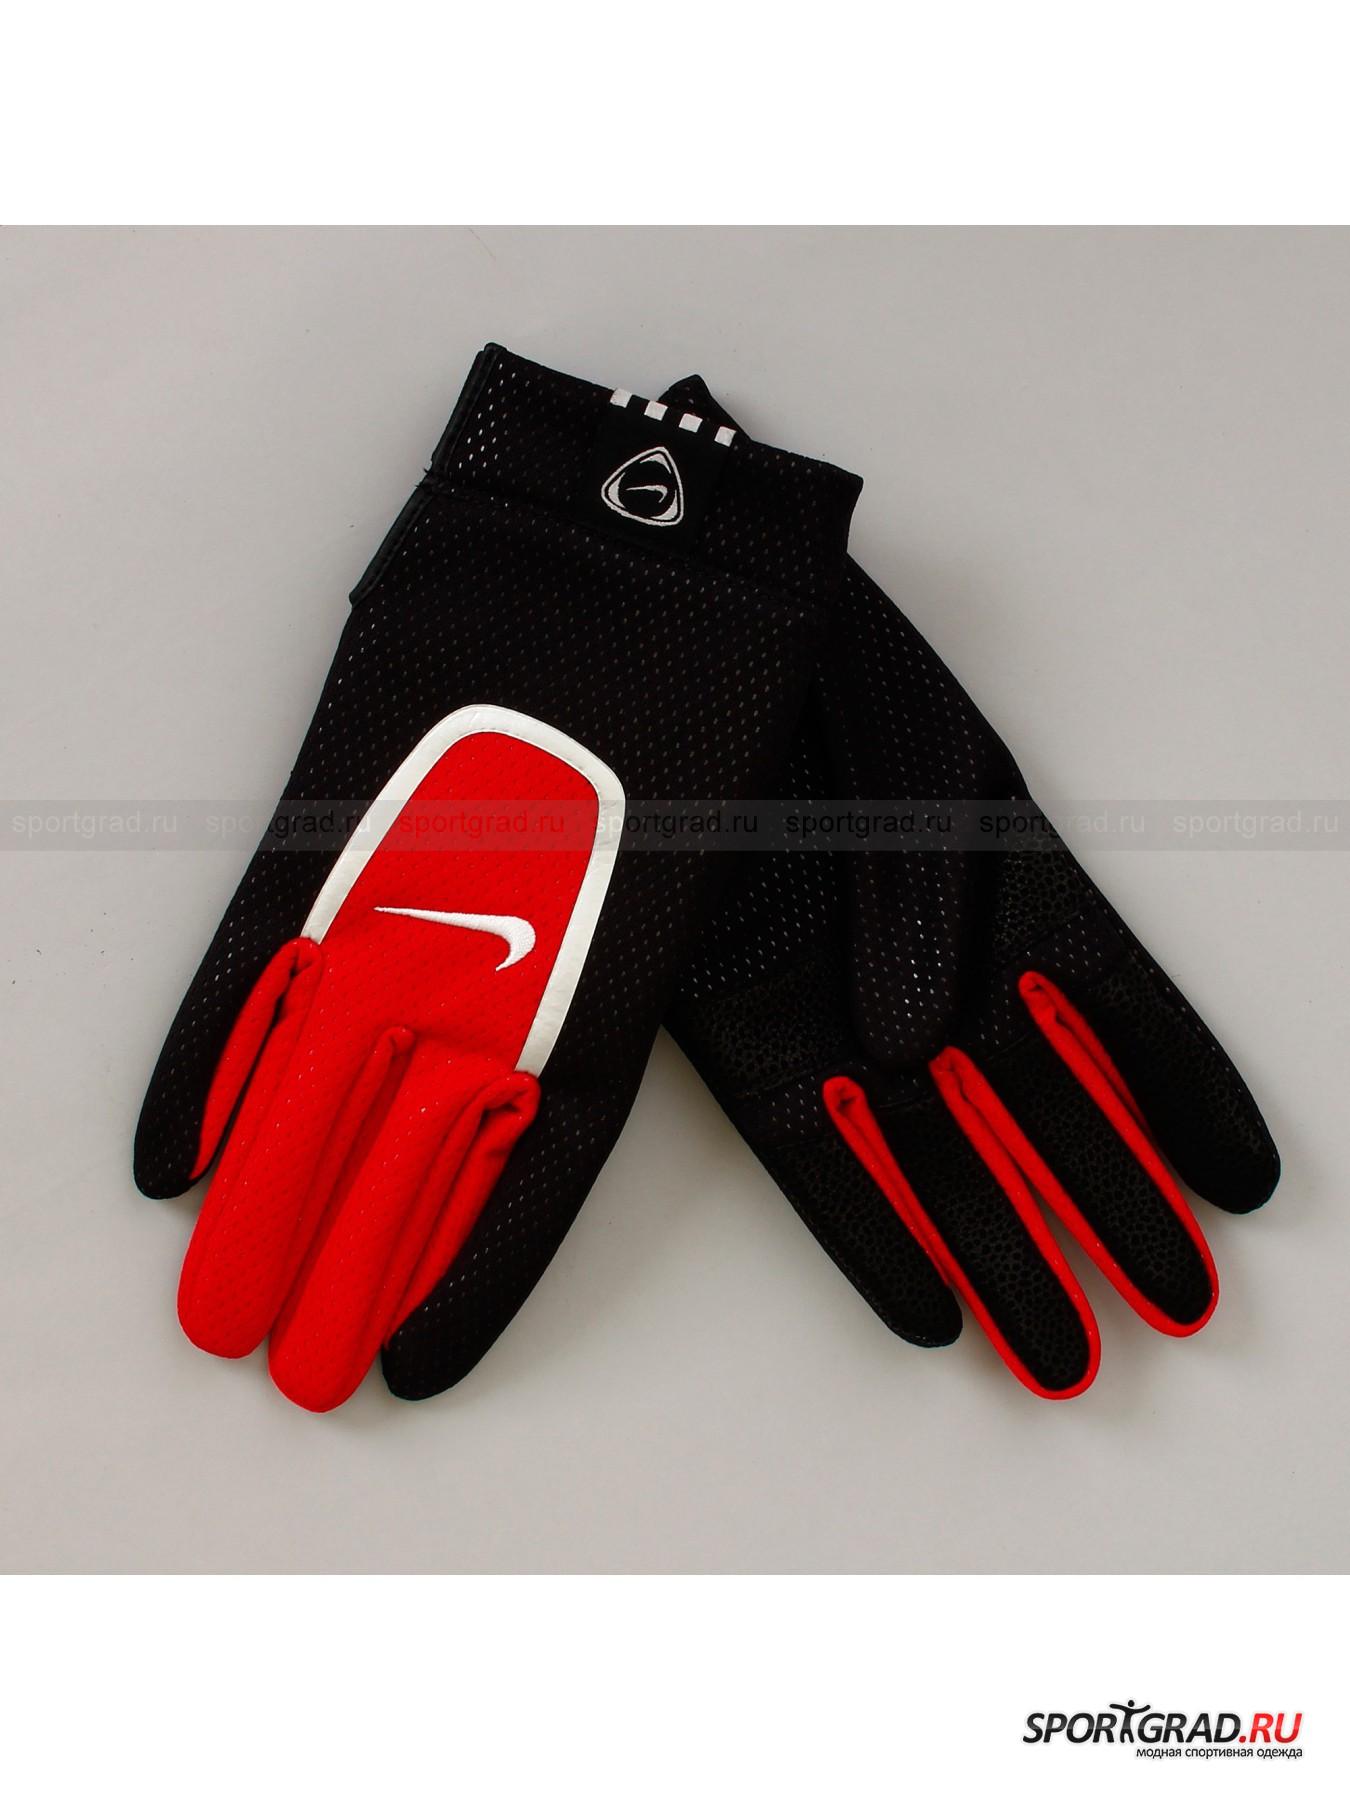 Перчатки игровые для футбола  NIKE Field Player V от Спортград